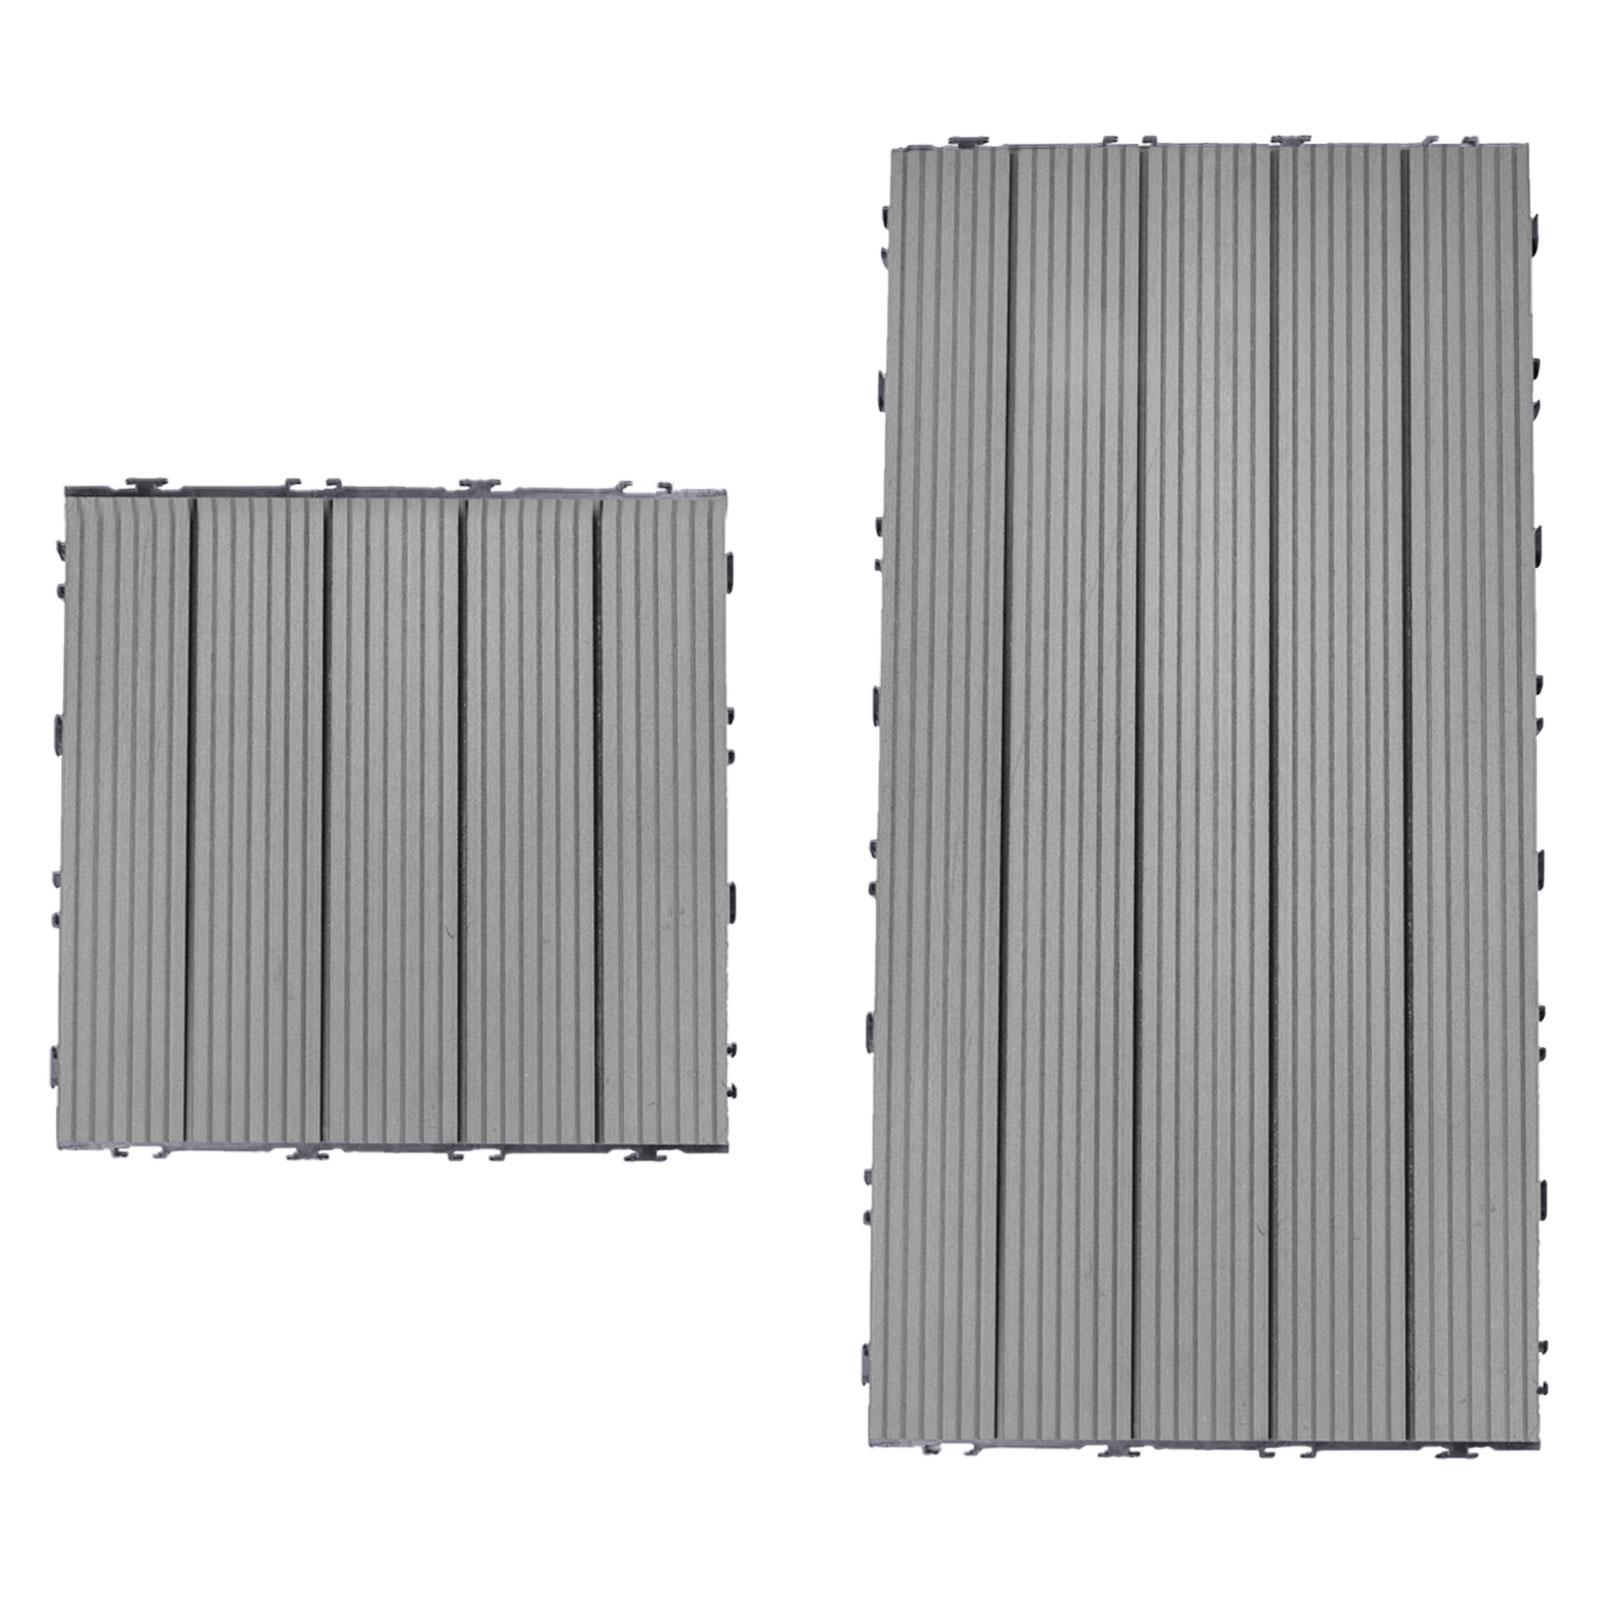 Terrassenfliesen-WPC-Klickfliesen-Balkonfliese-Holzfliese-Kunststoff Indexbild 4